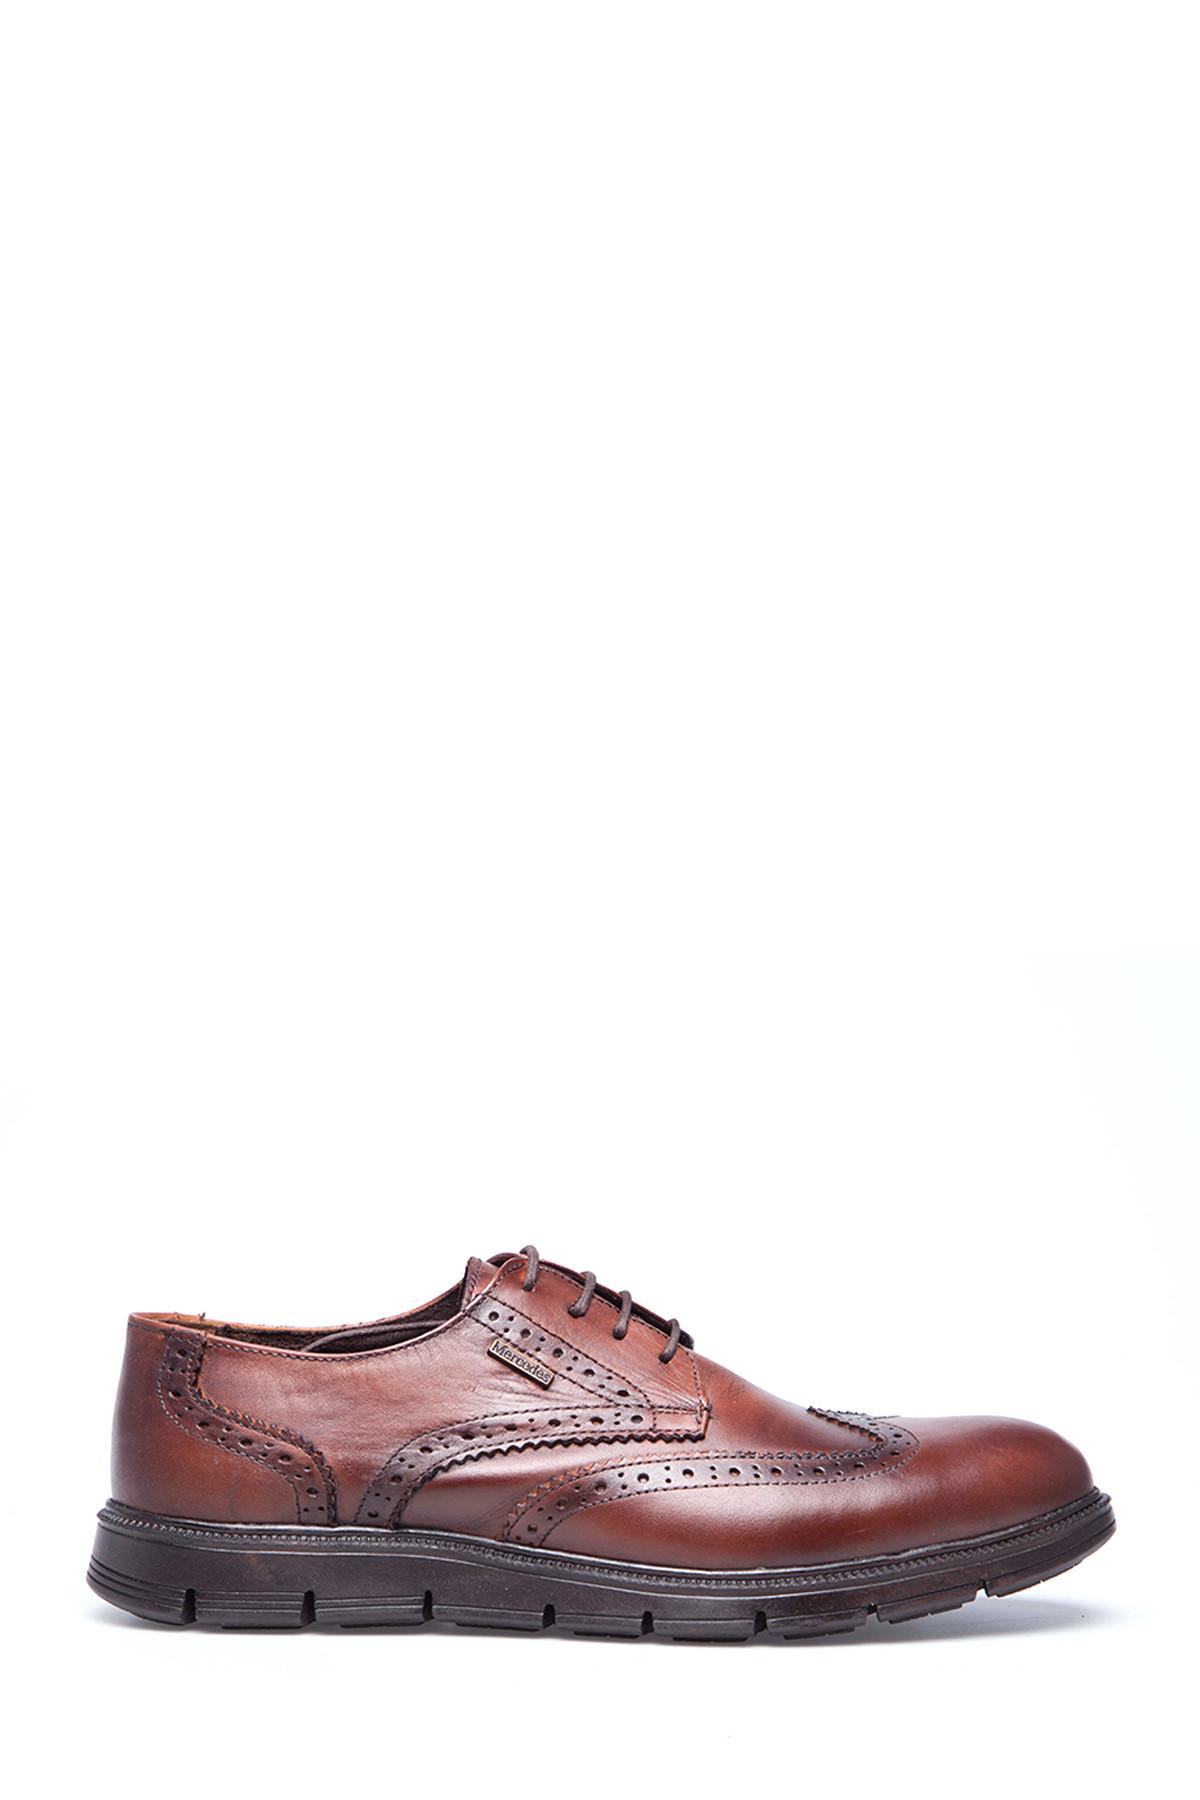 MERCEDES Erkek Taba Casual Ayakkabı - Alfonso 1